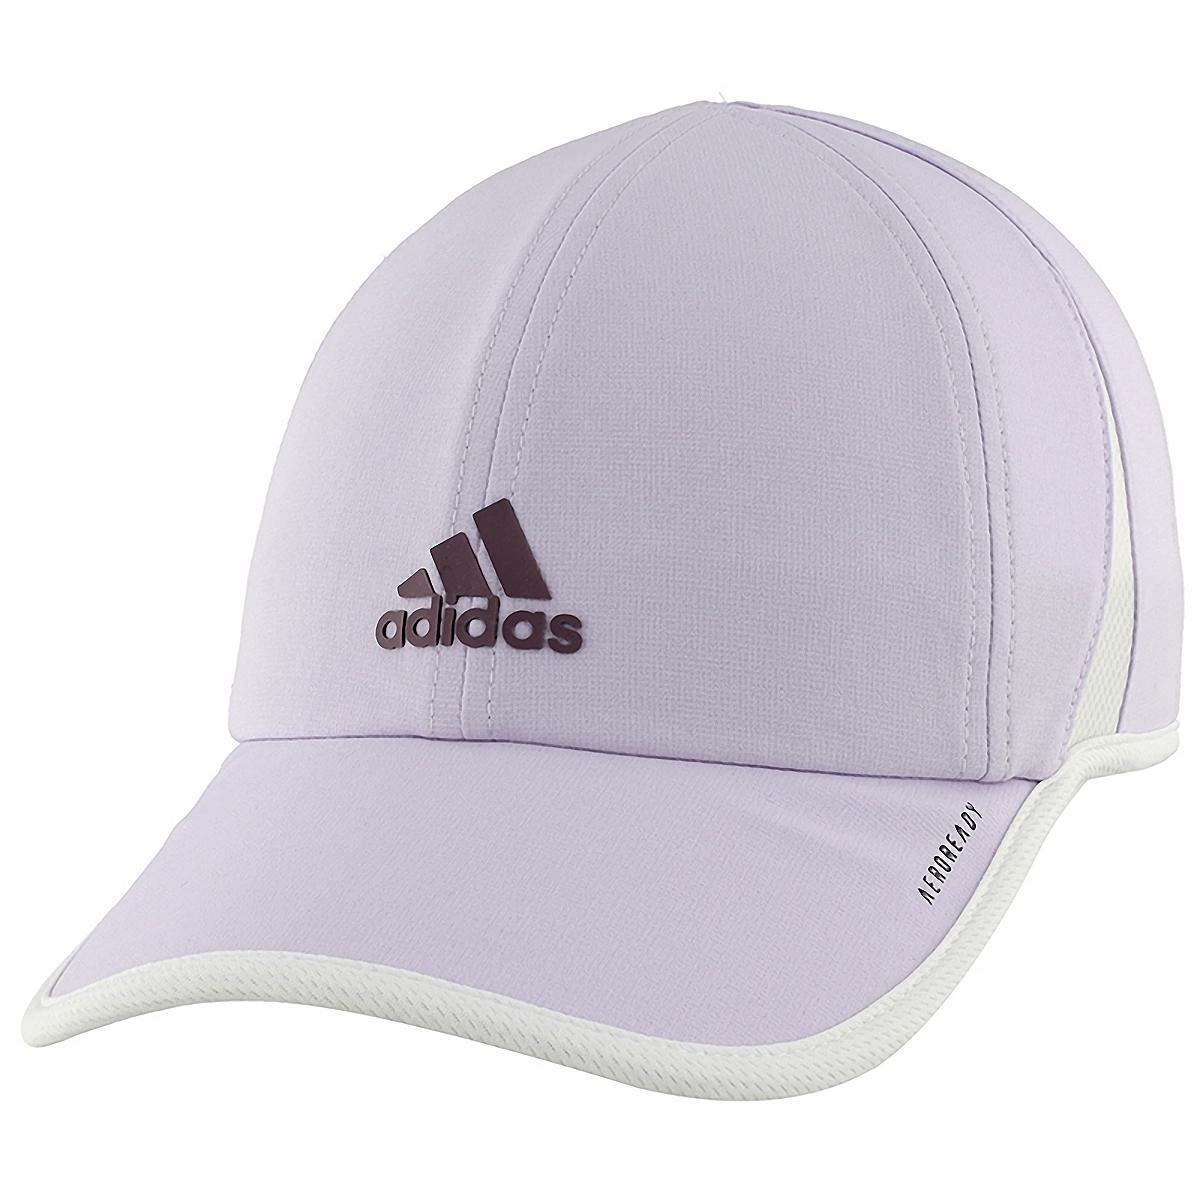 Women's Adidas Superlite Cap - Color: Purple Tint/Legacy Purple - Size: One Size, Purple Tint/Legacy Purple, large, image 1